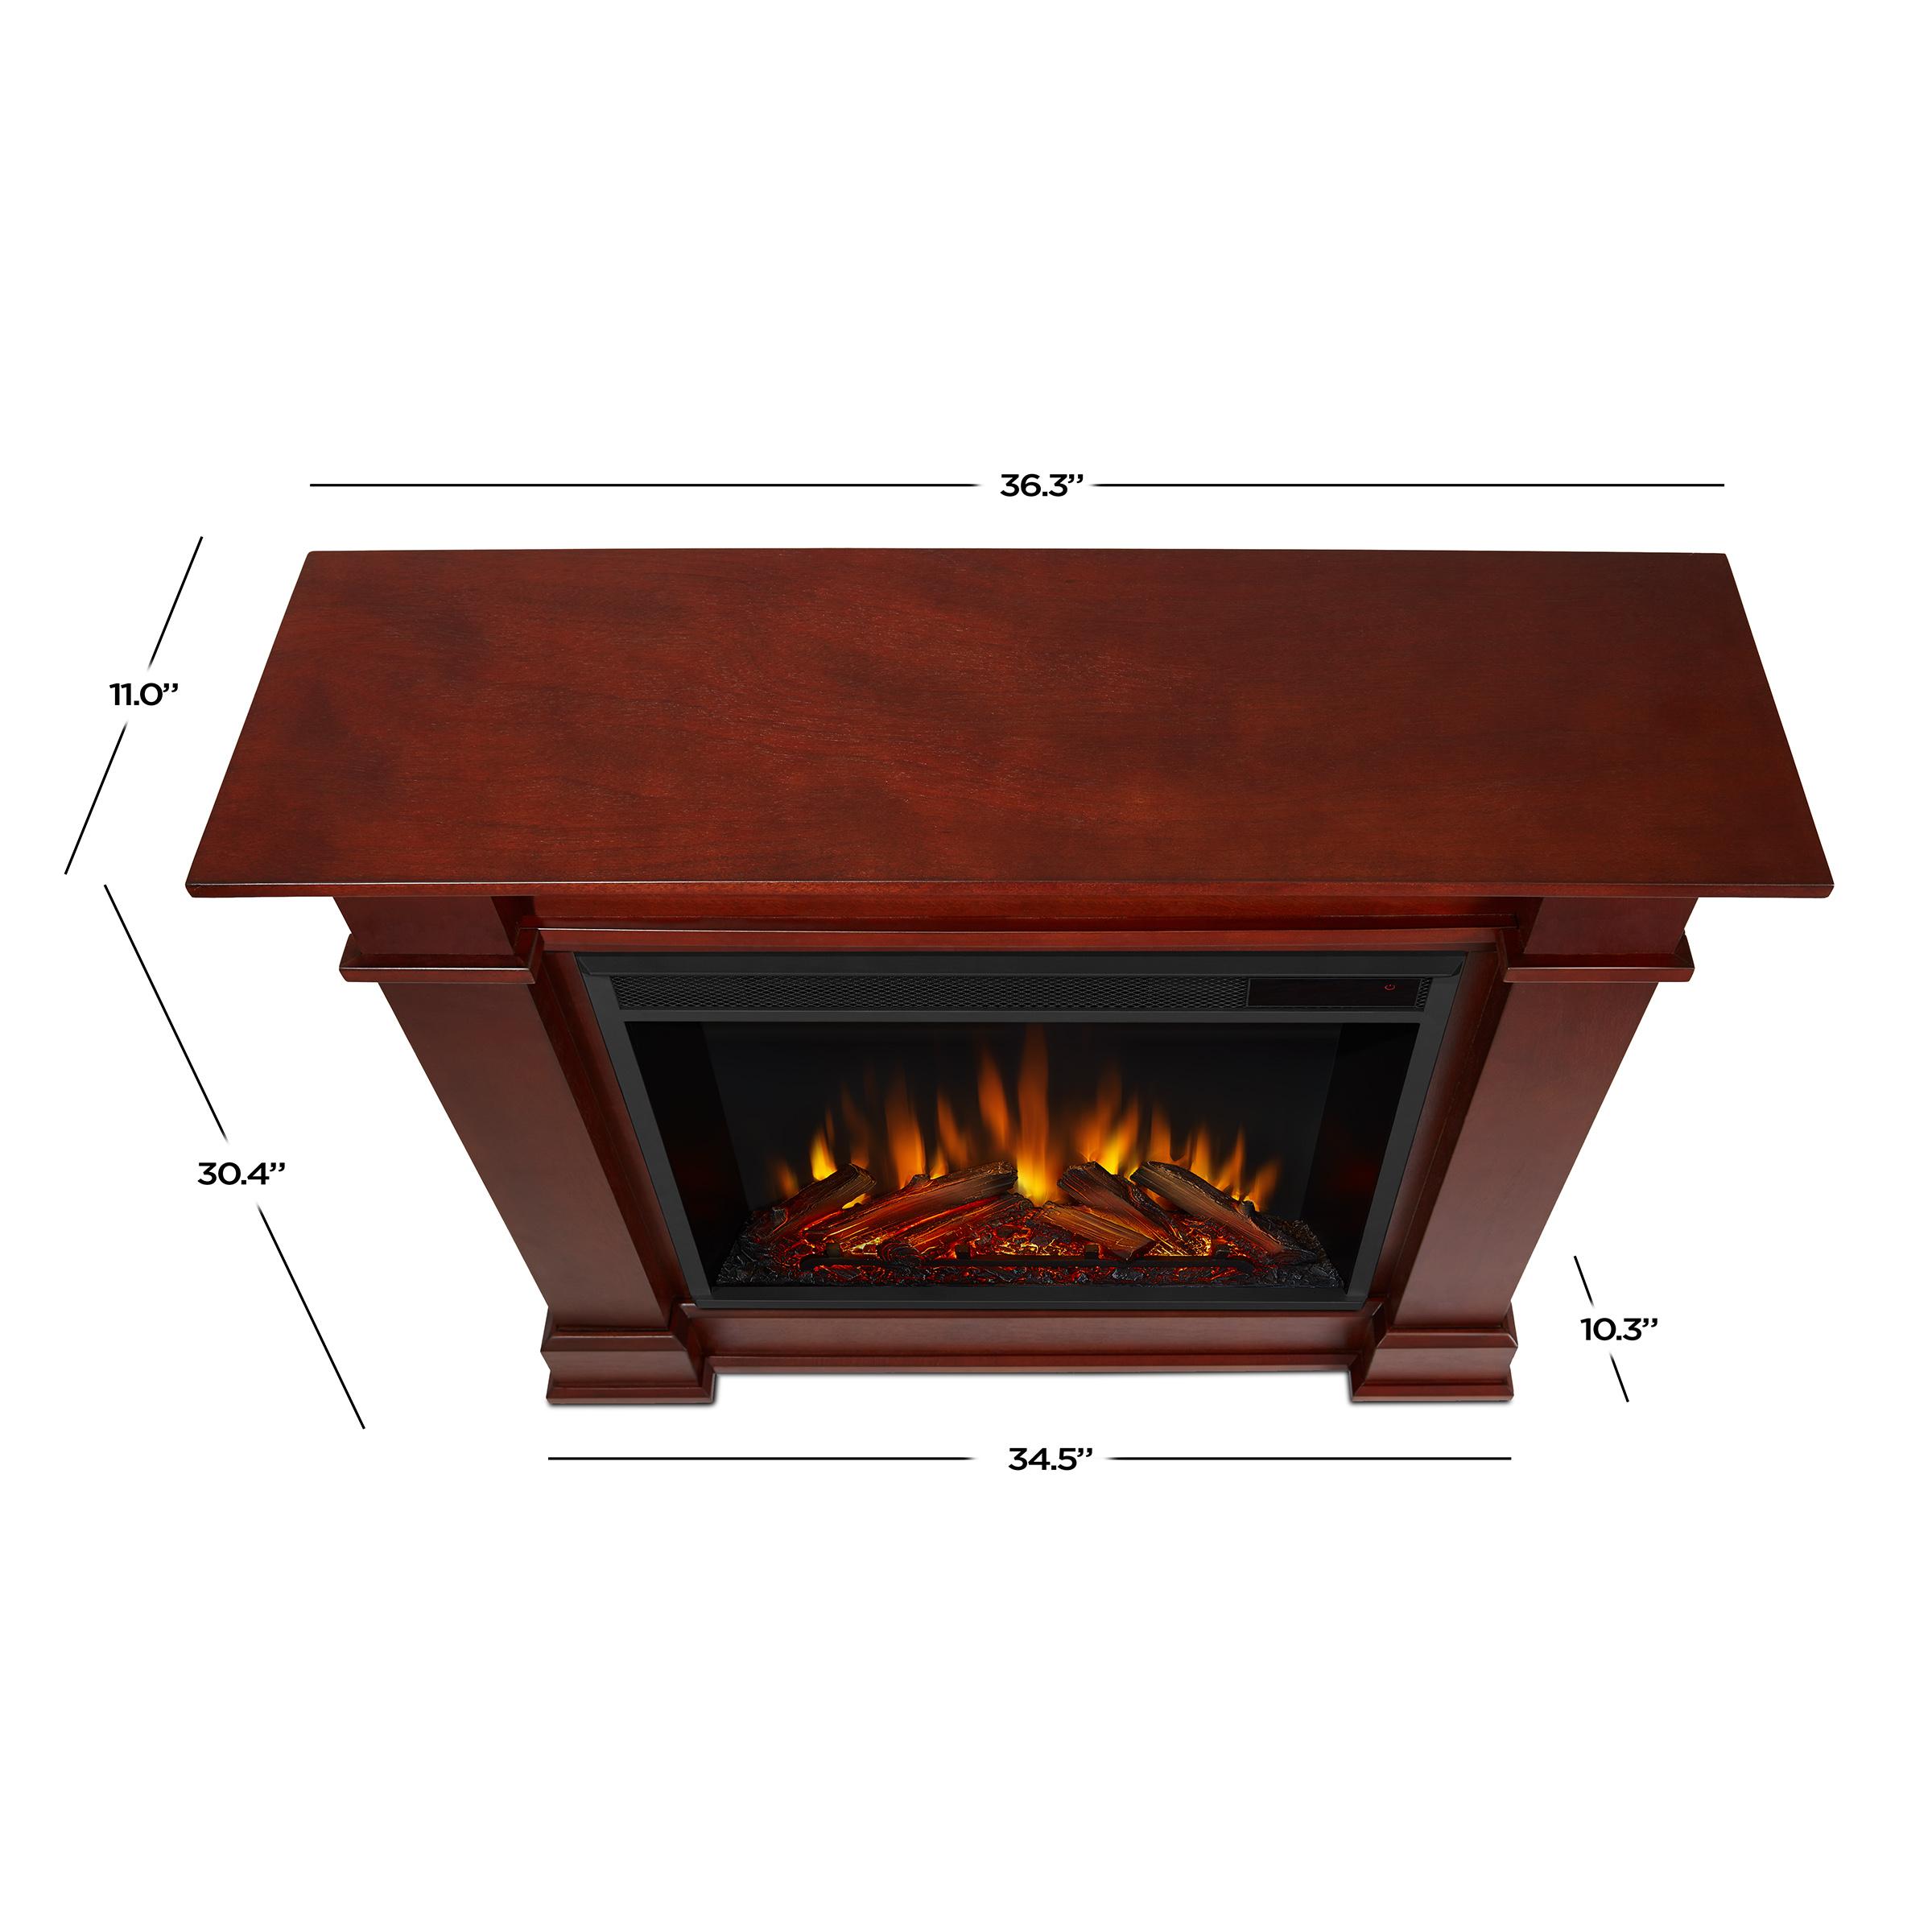 Dark Espresso Electric Fireplace Dimensions